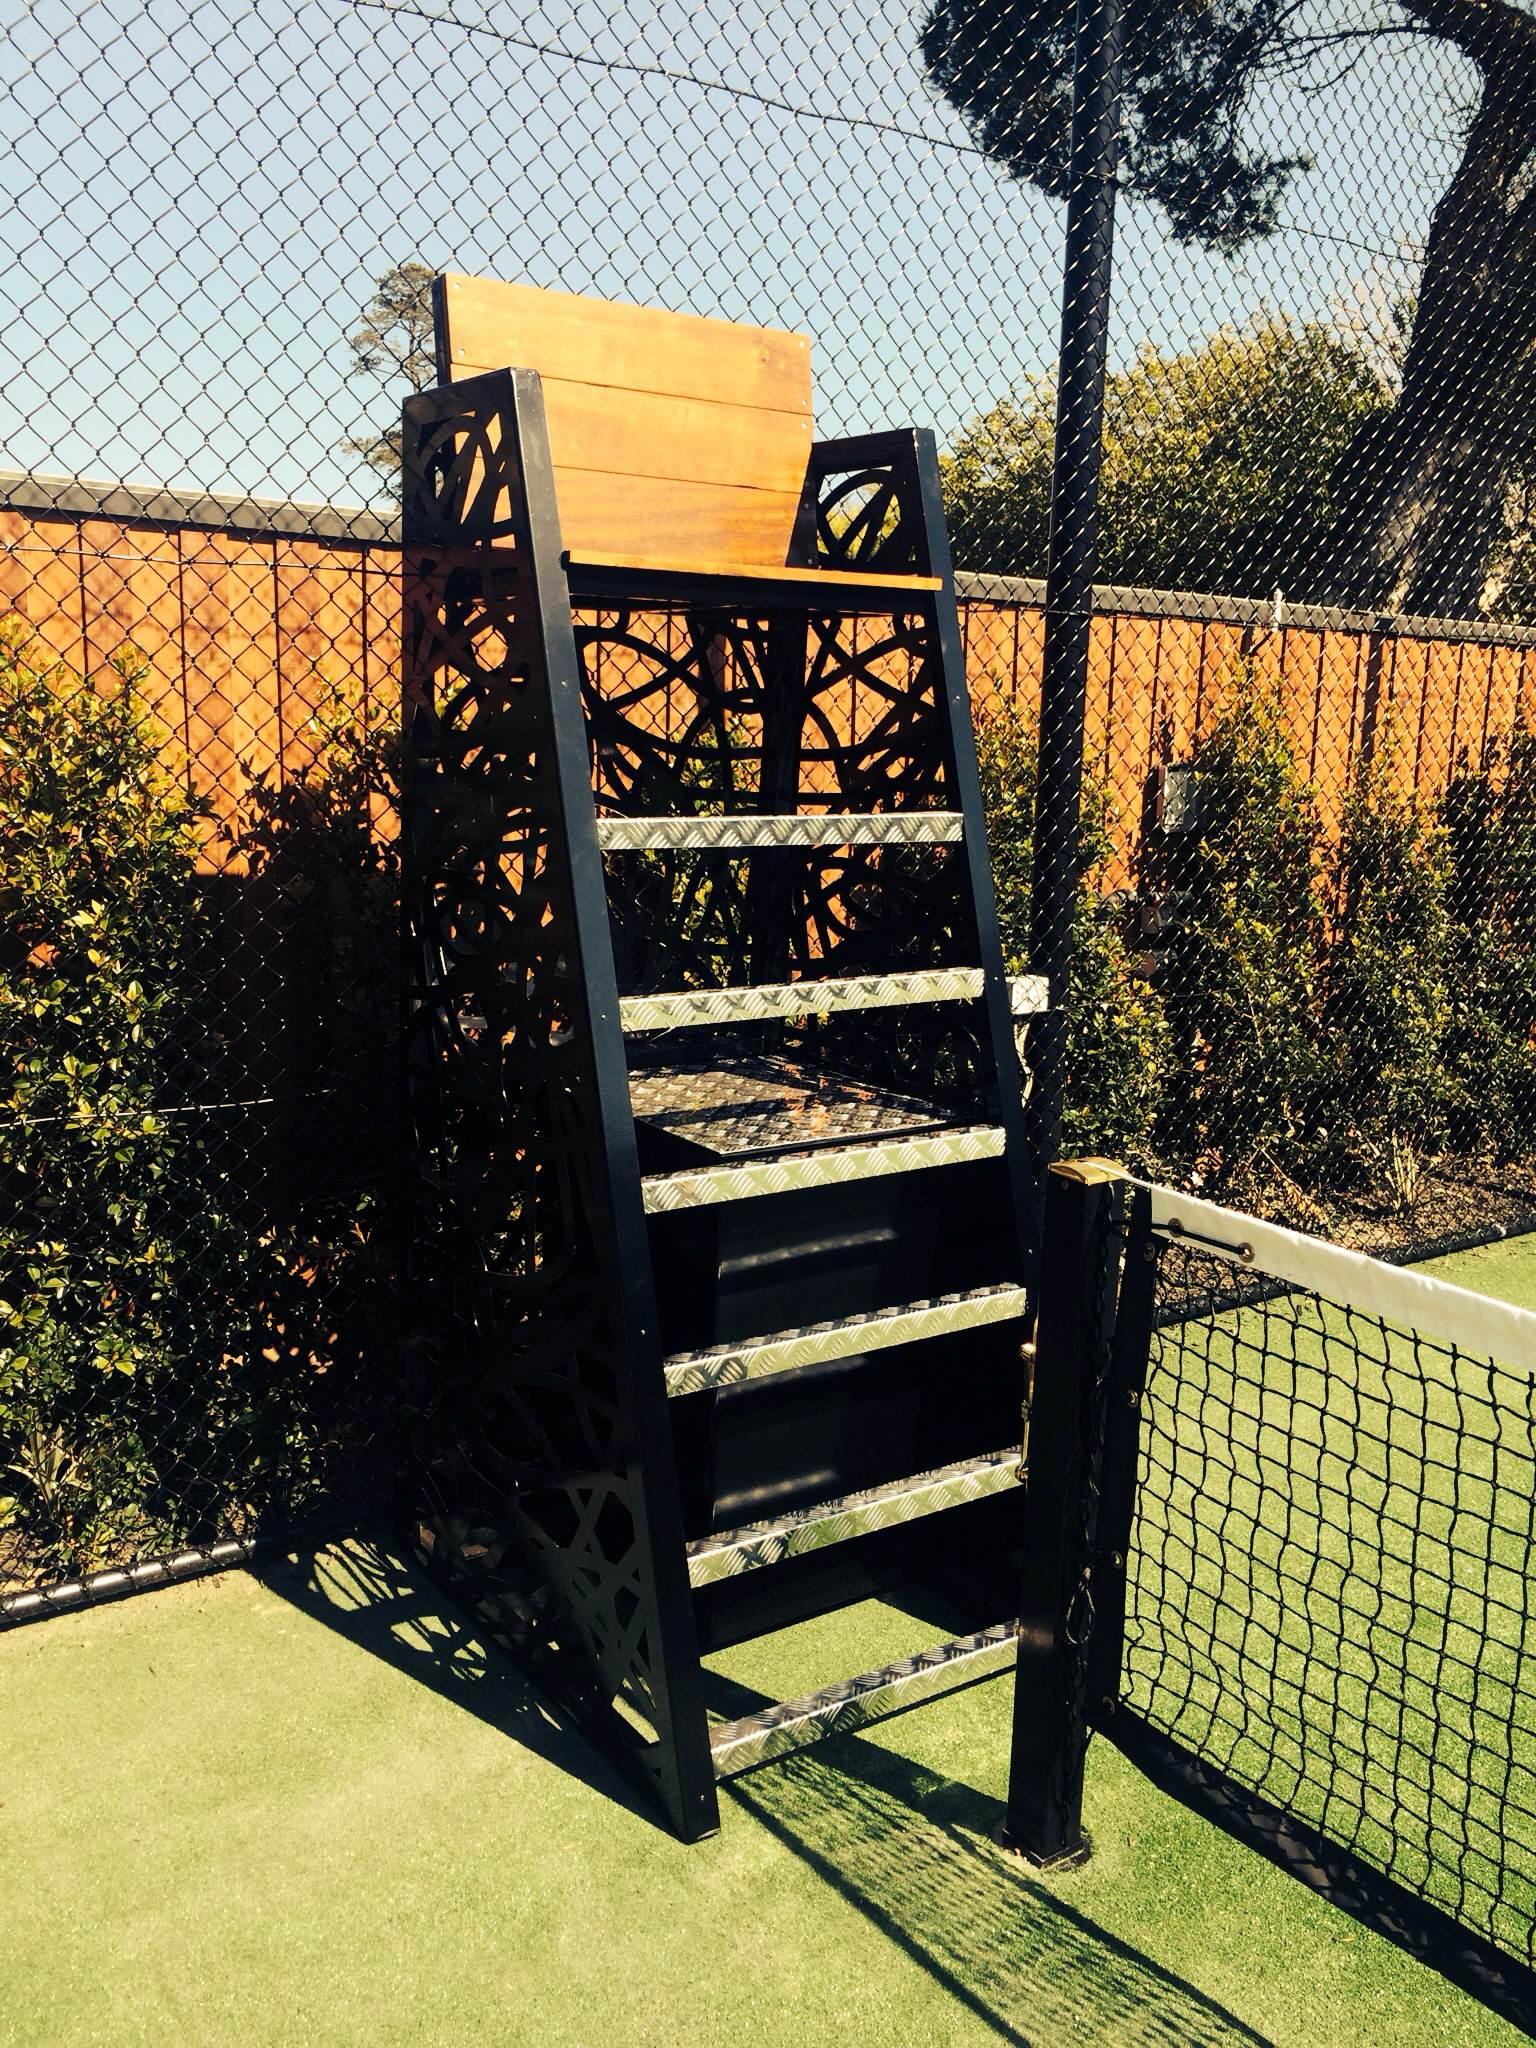 Tennis Court Chairs